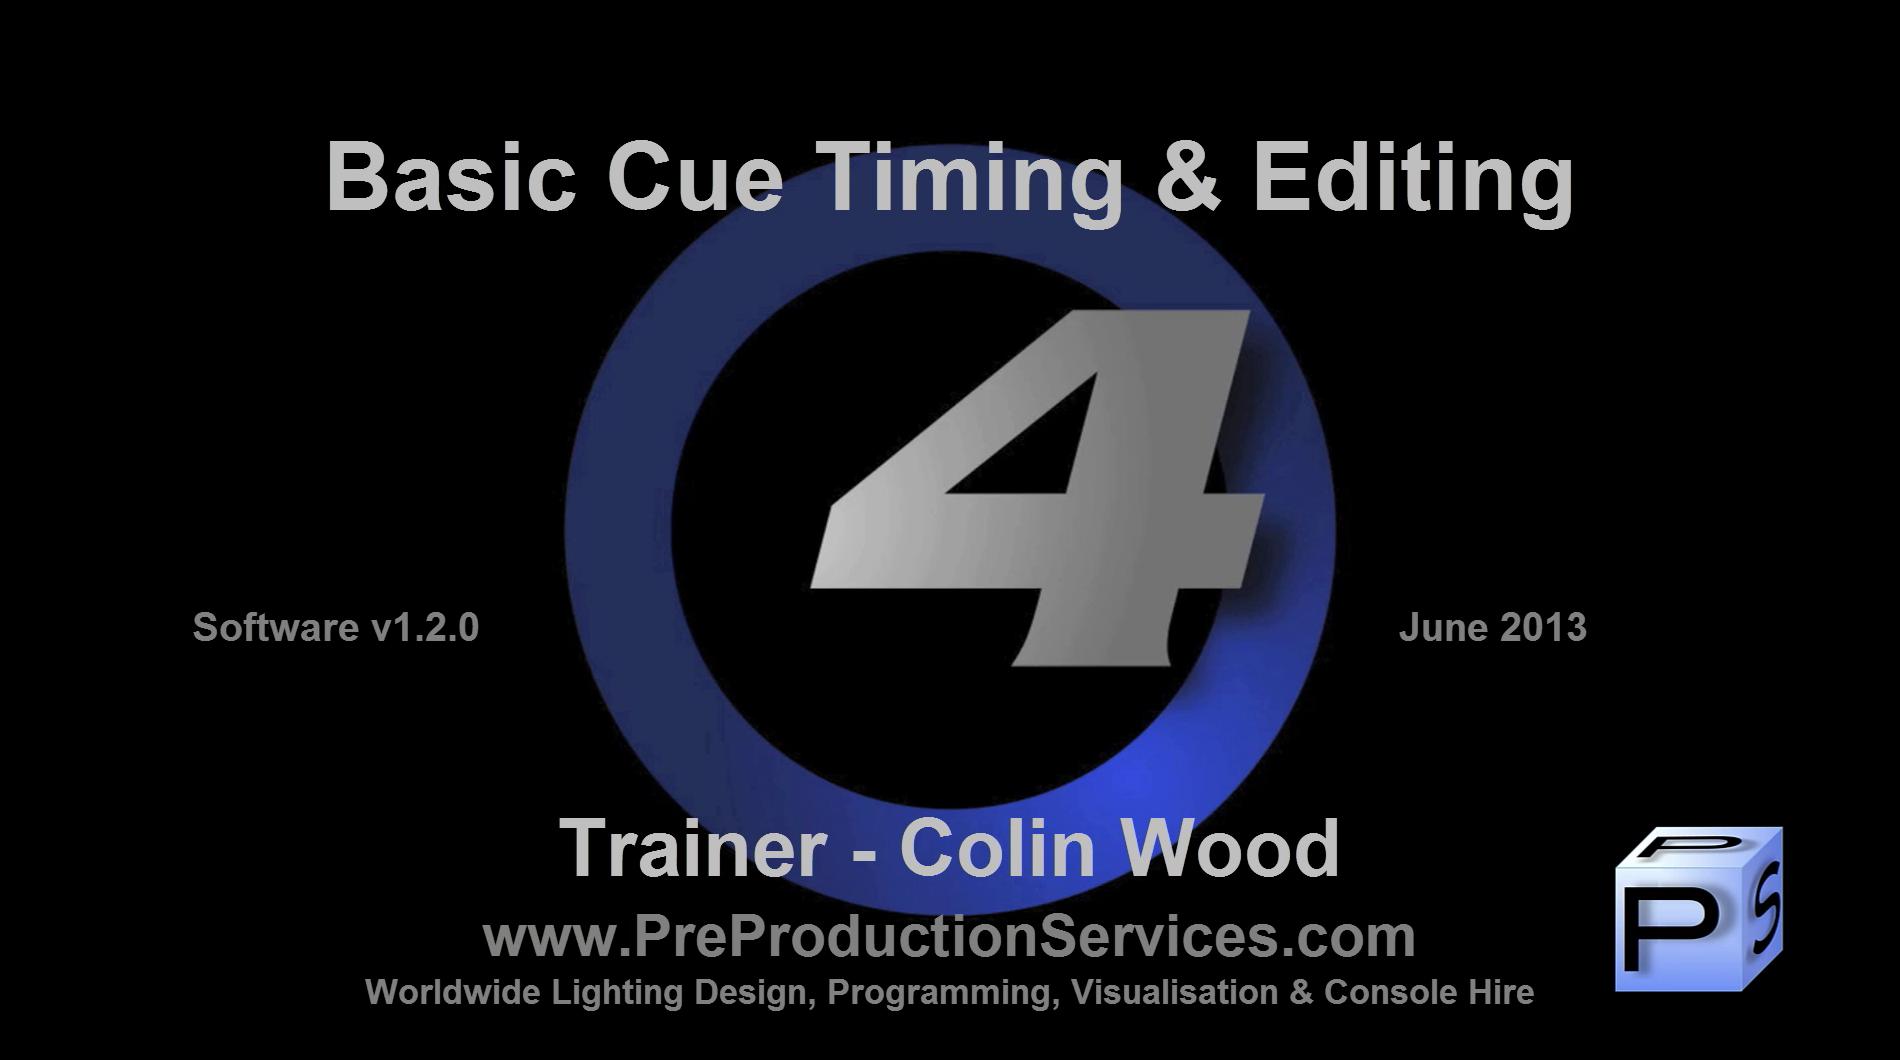 Colib Wood West Side Story Album Thumbnail.jpg